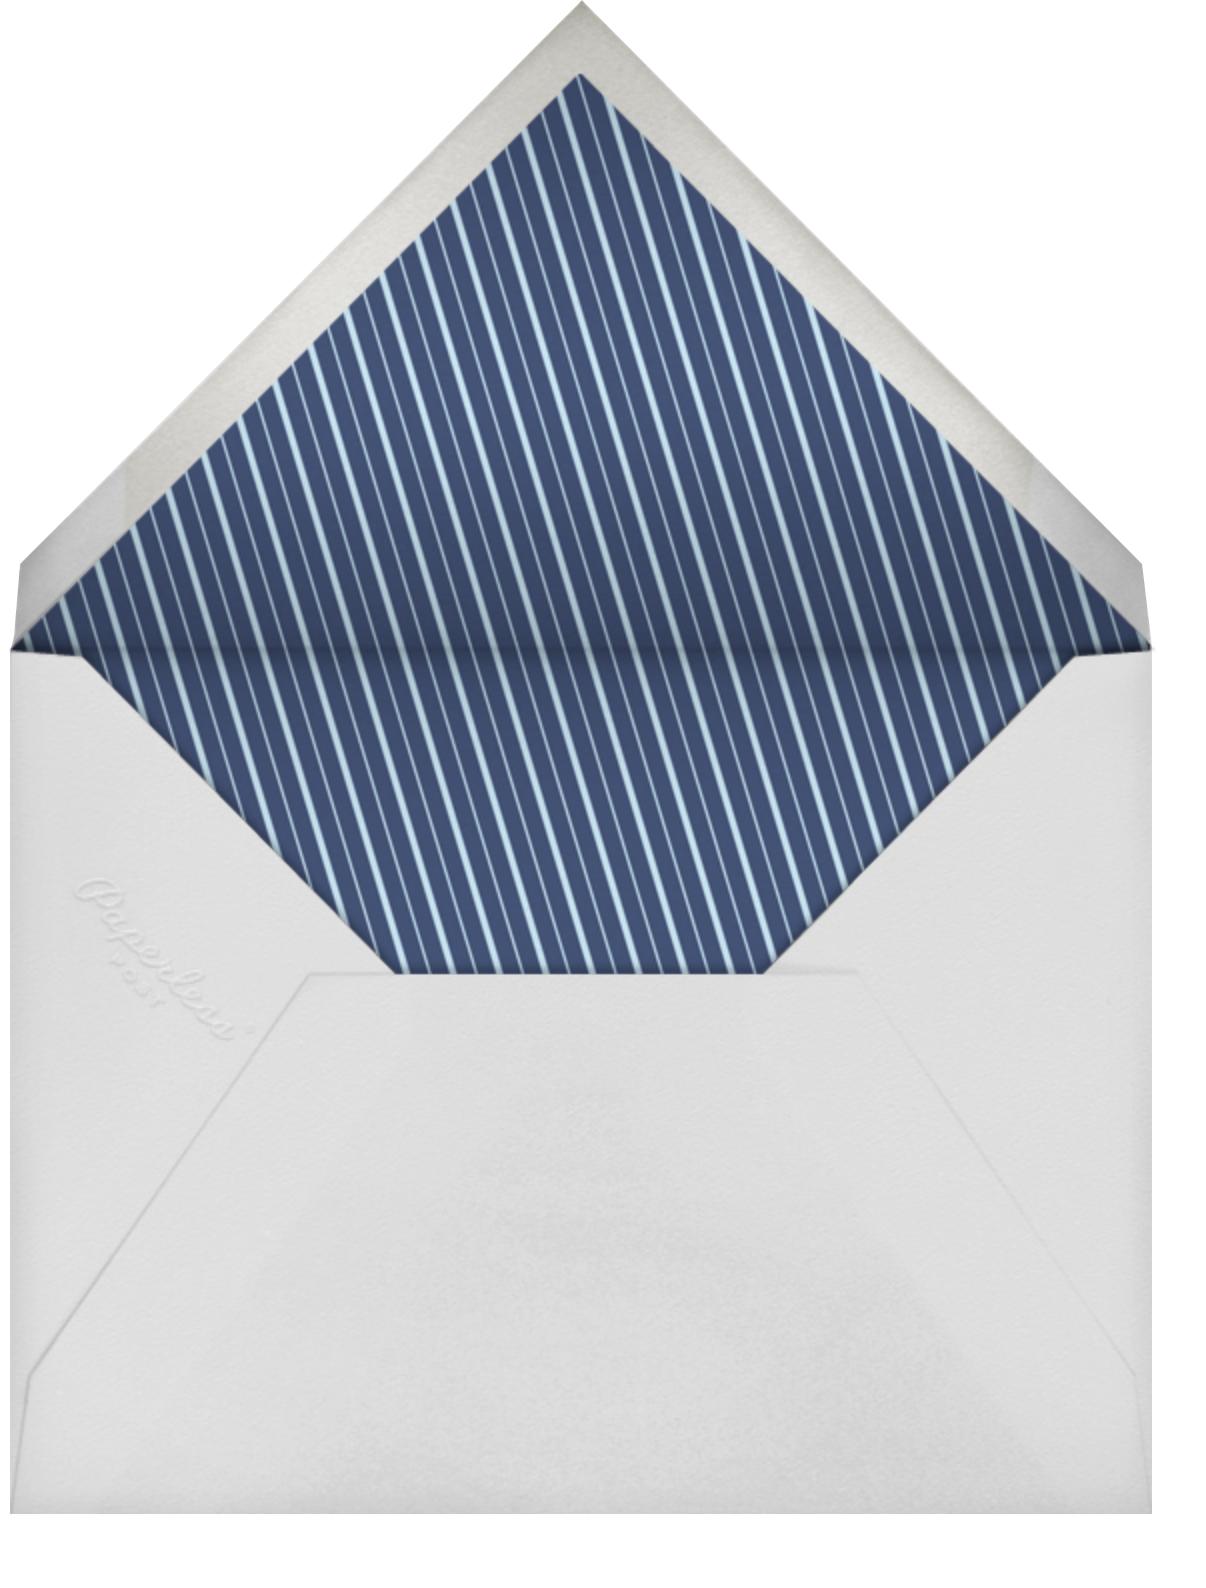 Forsythia (Horizontal) - Midnight with White - Paperless Post - General entertaining - envelope back